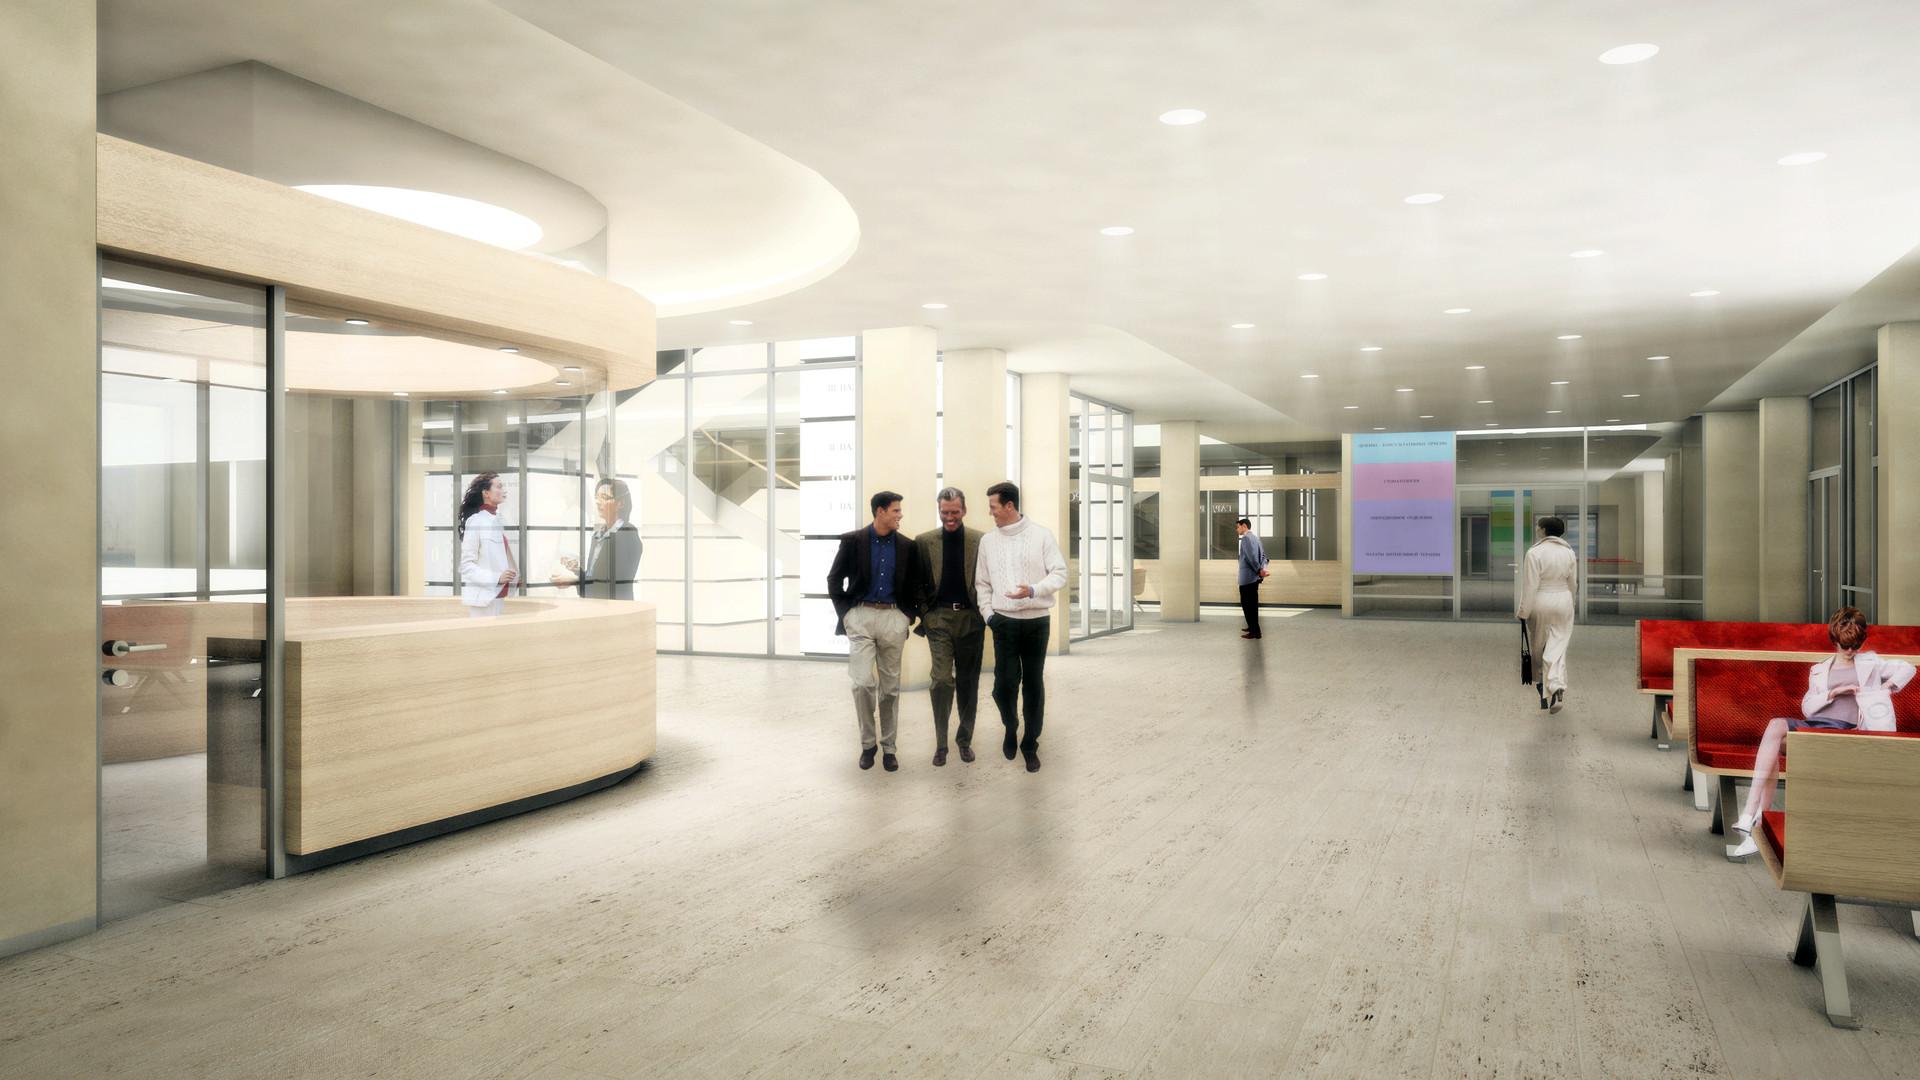 Nishnij Tagil Medizinisches Zentrum Foyer